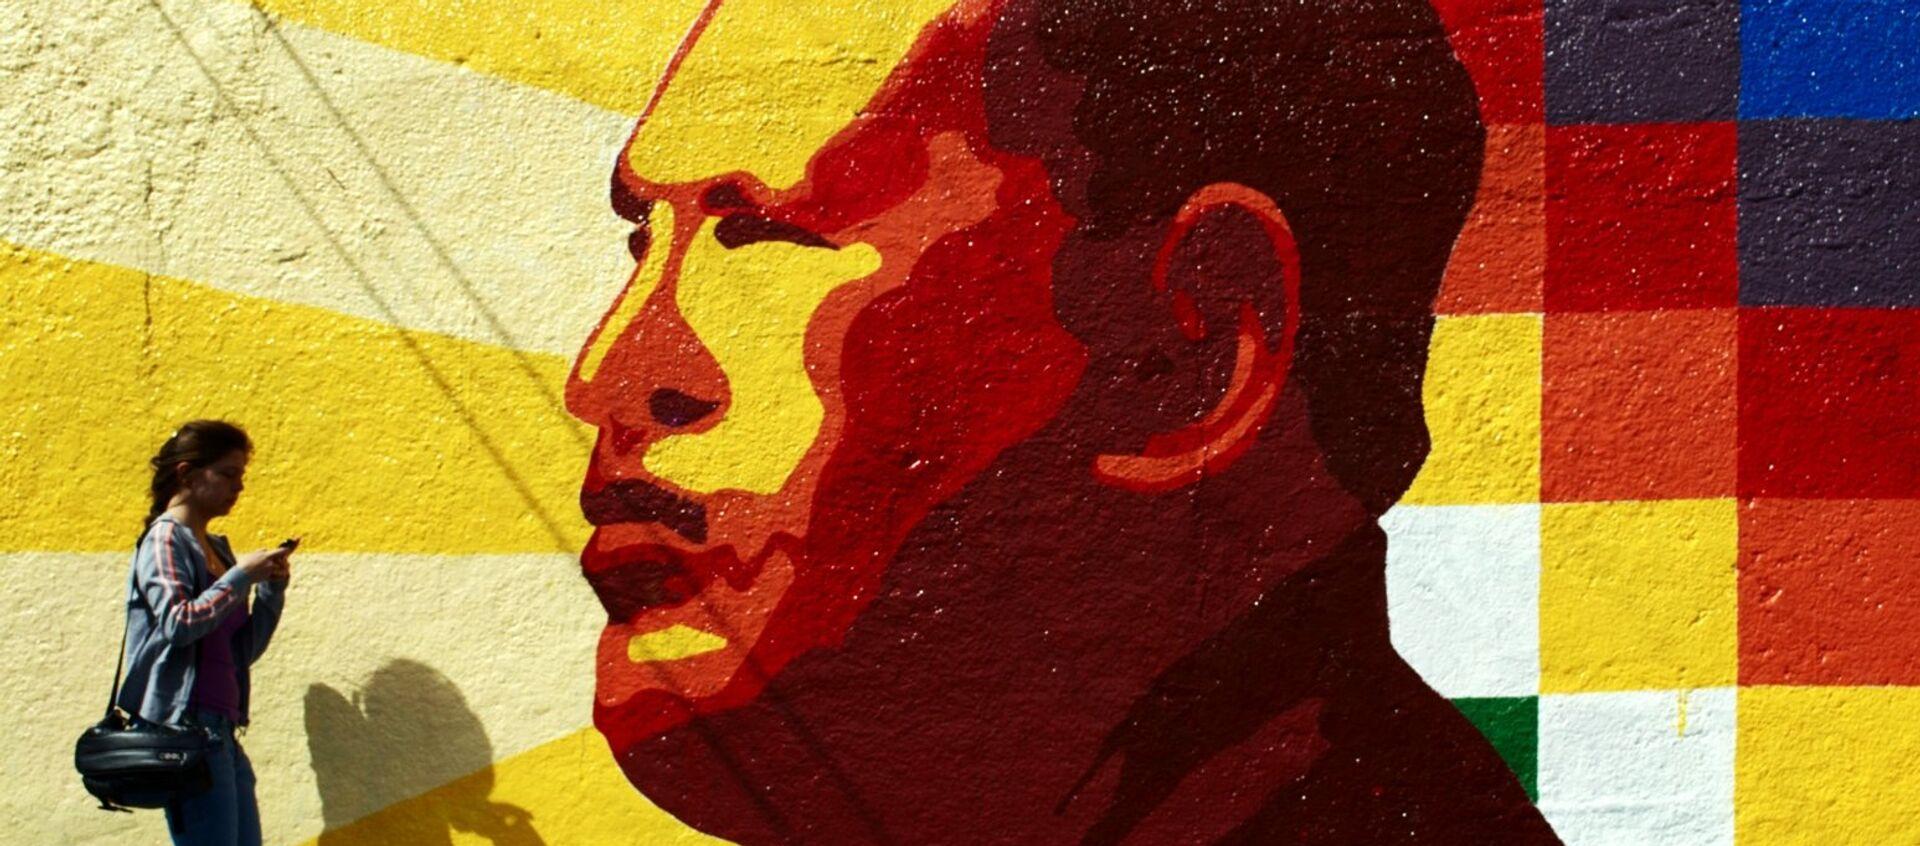 Graffiti con un retrato de Hugo Chávez - Sputnik Mundo, 1920, 05.07.2019